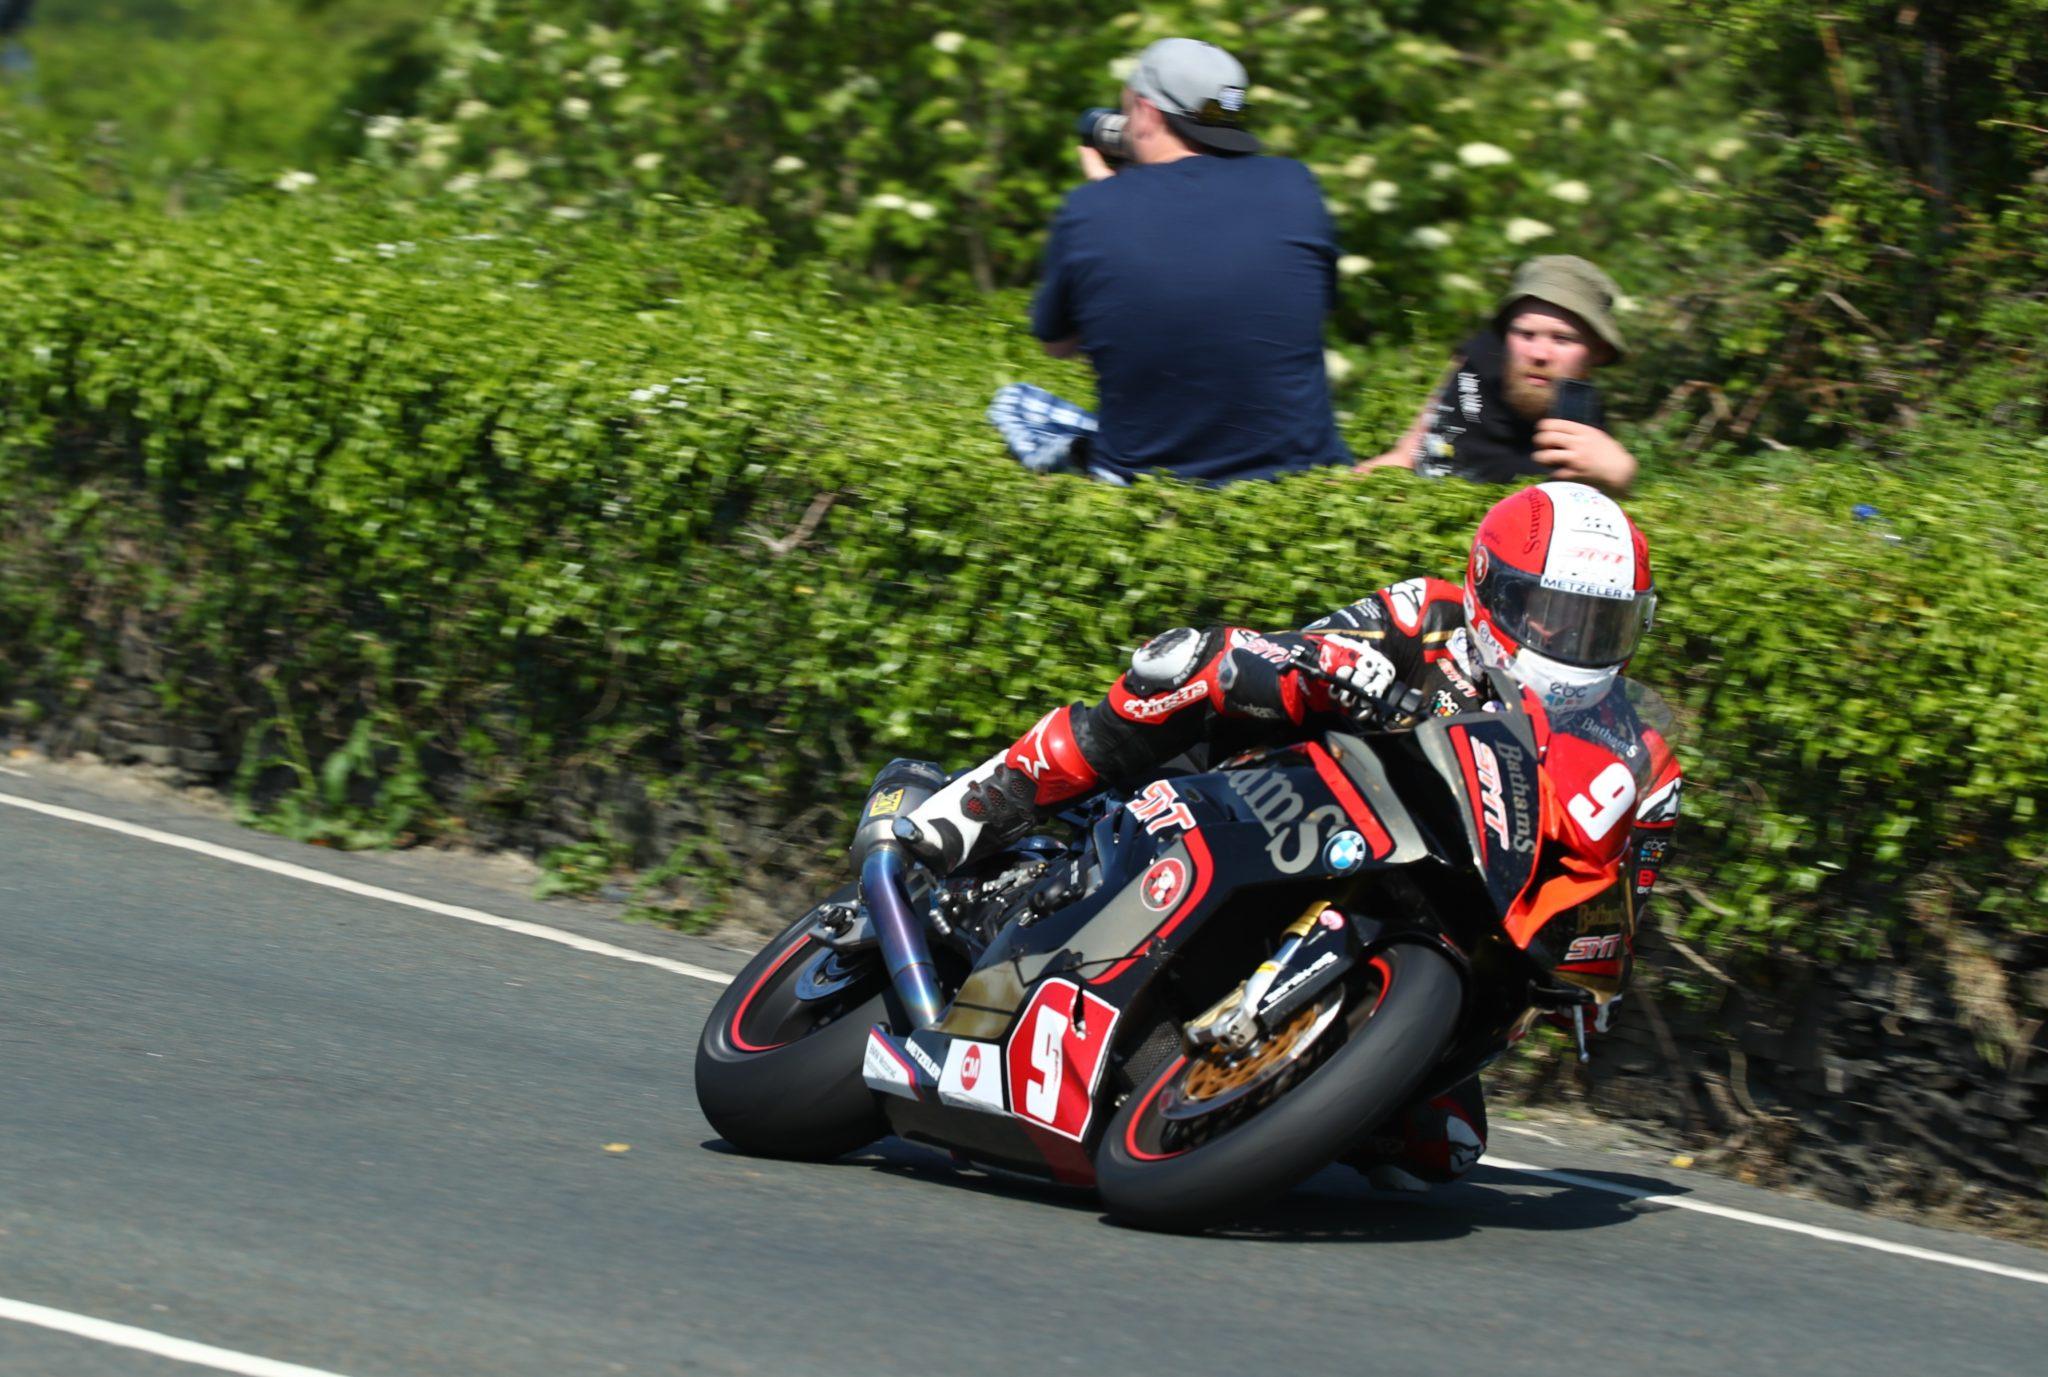 Michael Rutter, image credit Bathams SMT Racing